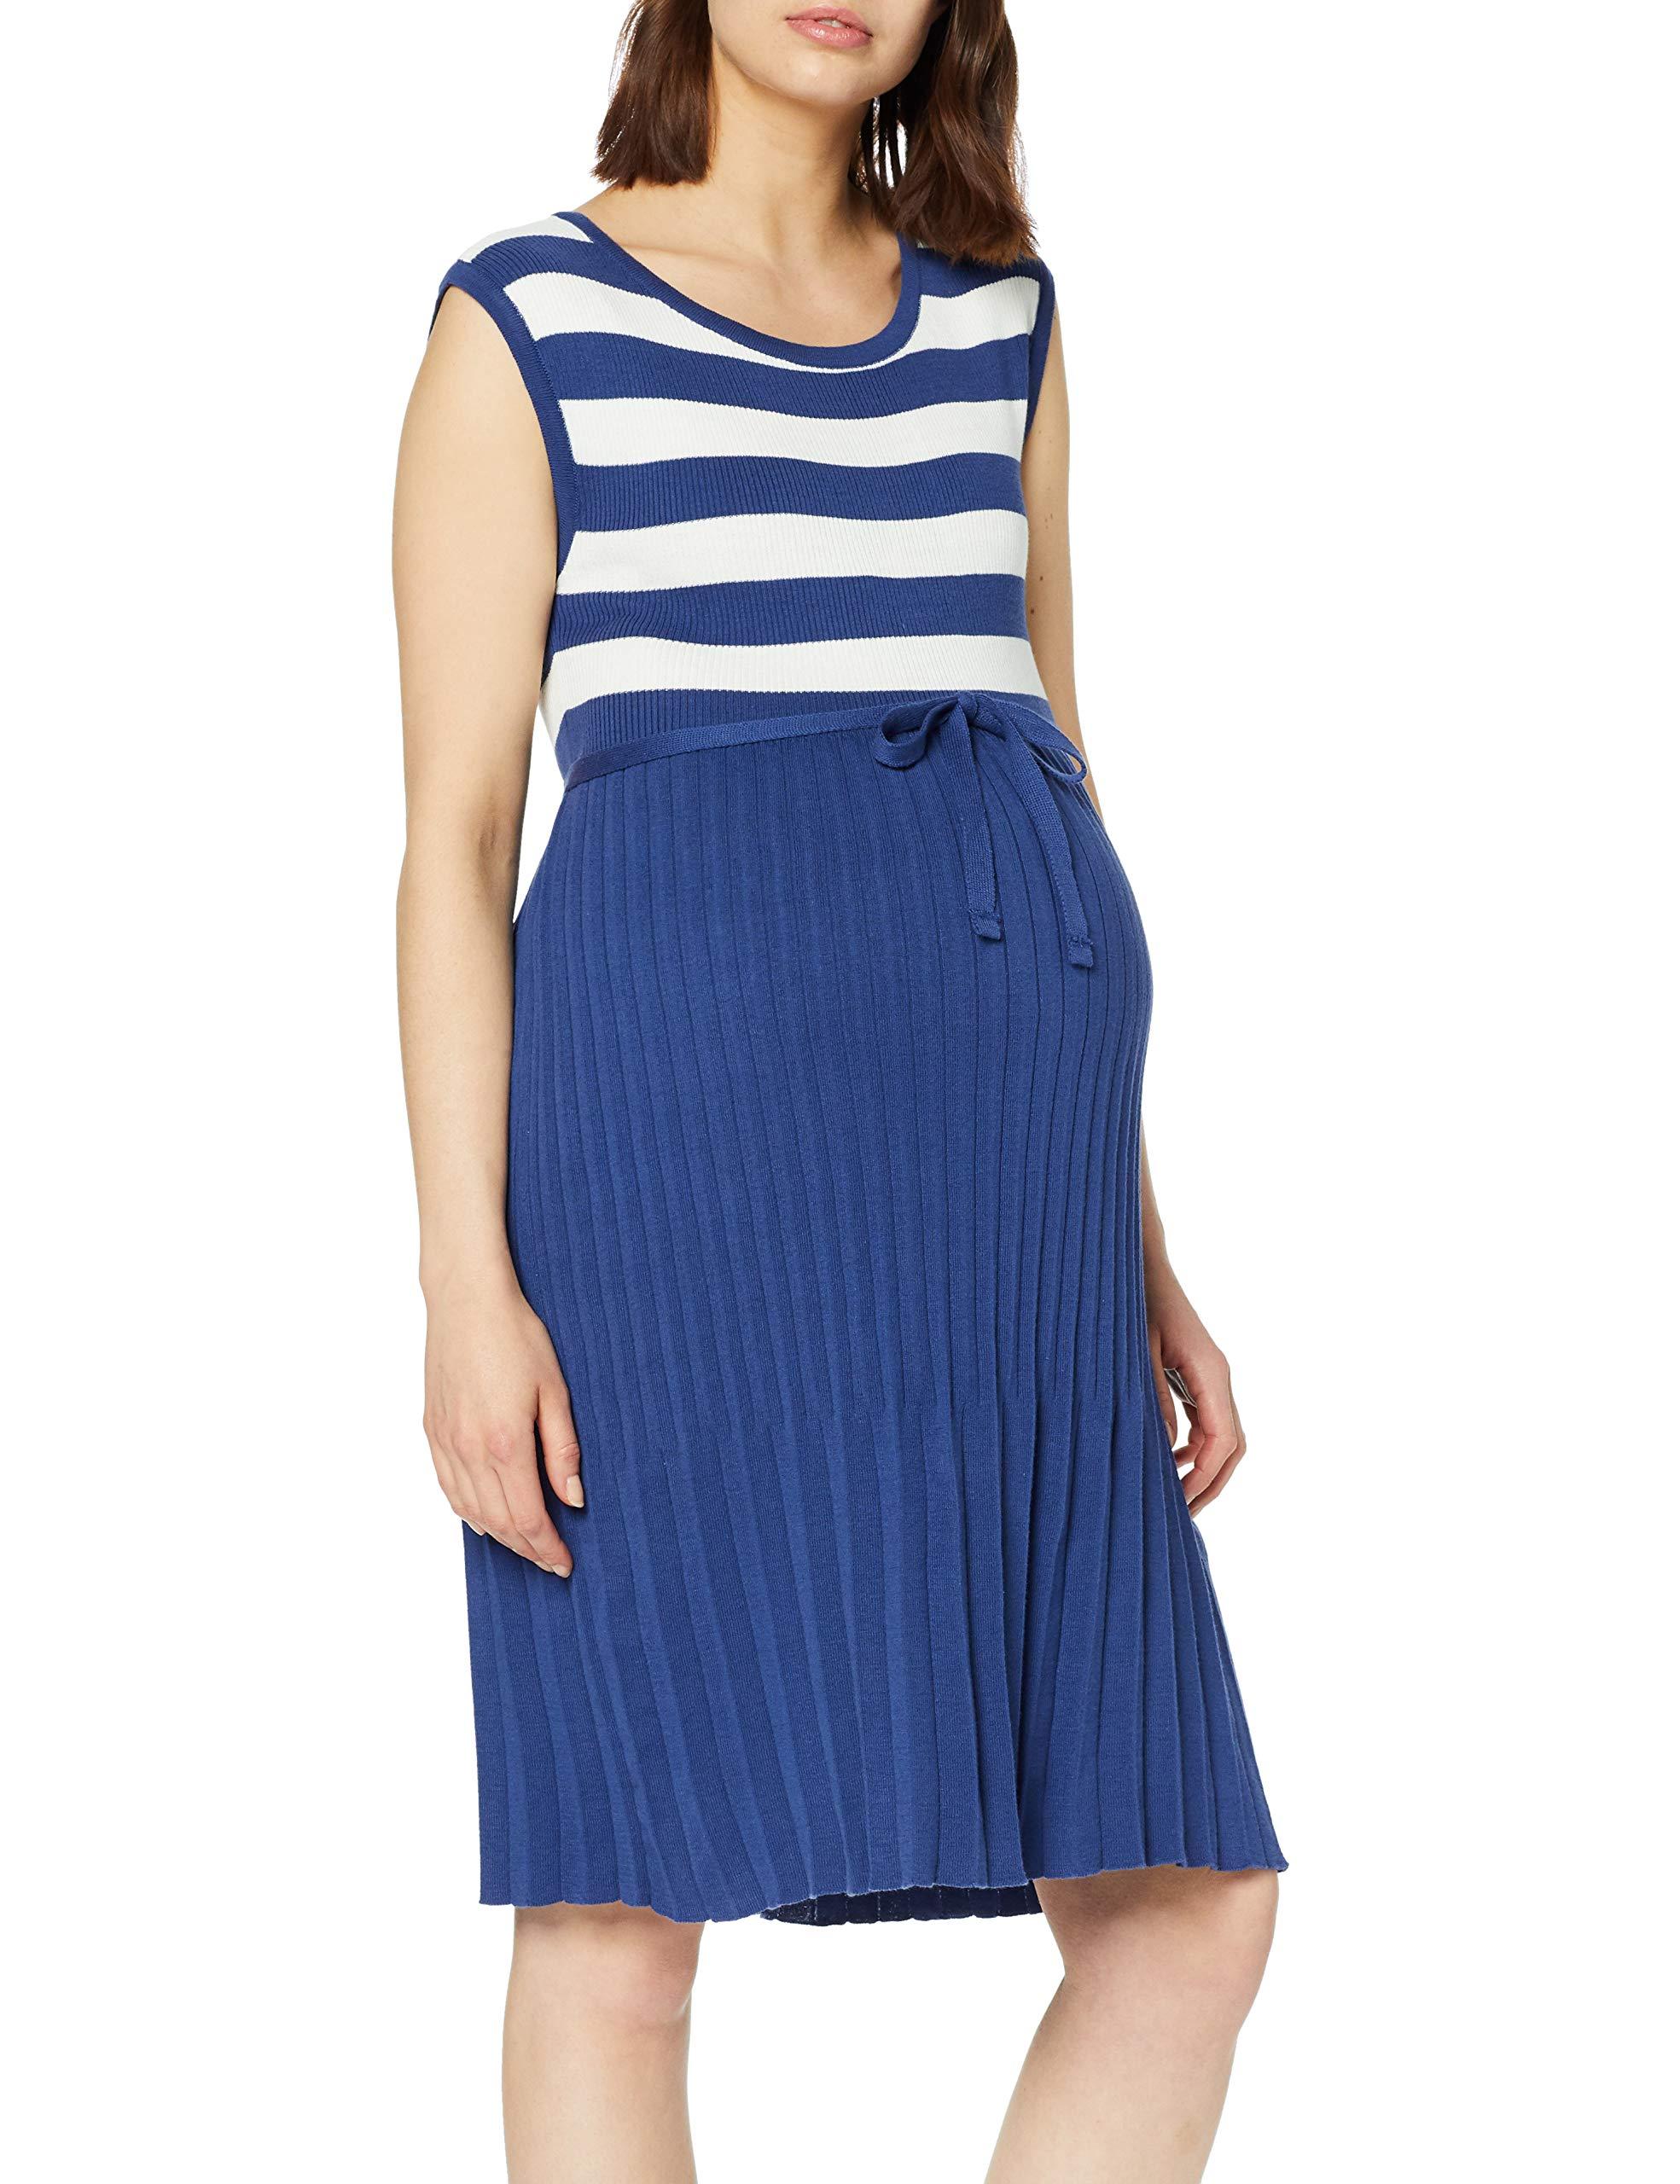 40544taille RobeMulticoloredark Blue Knit FabricantX largeFemme Esprit Maternity Dress Sl UGzqSMVp